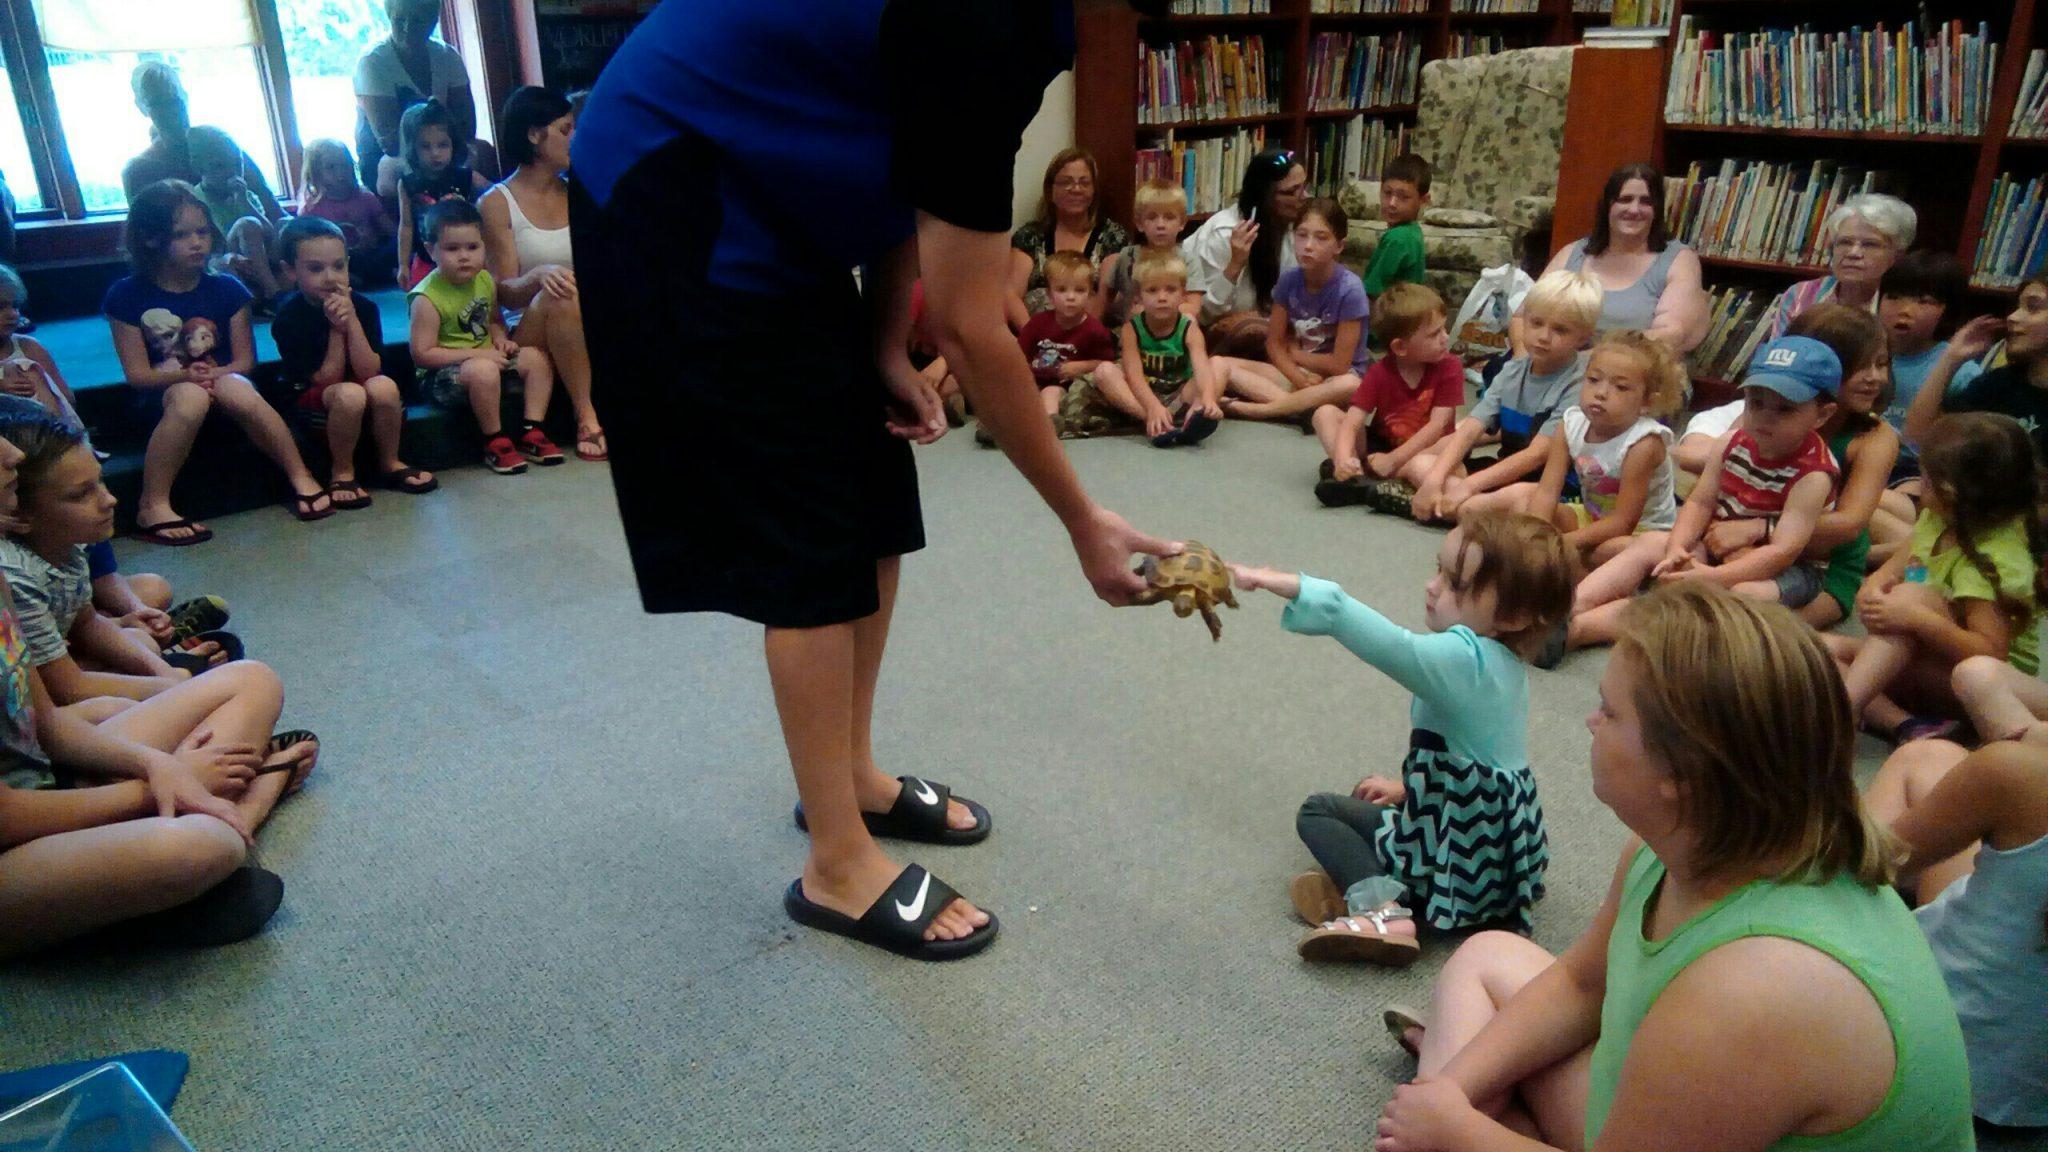 Meeting Tanglewood's tortoise